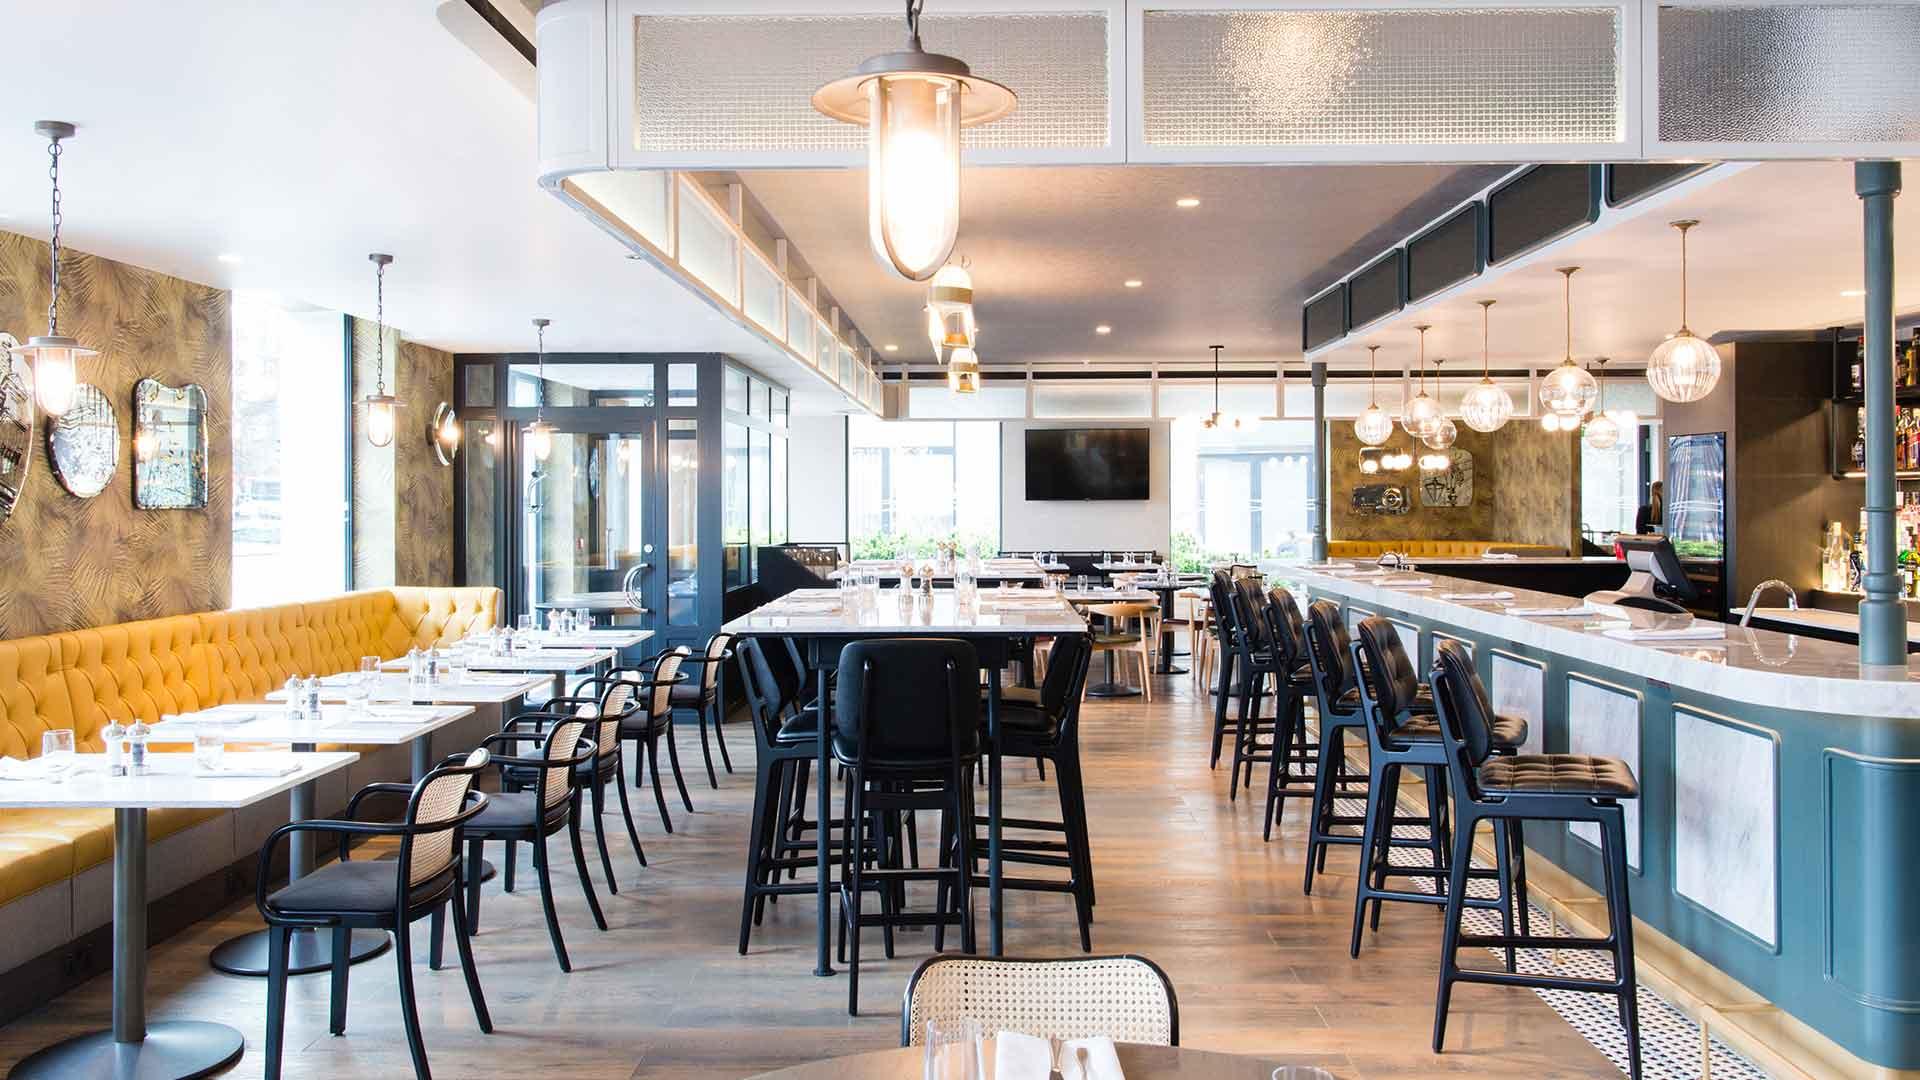 Lighting Design Scheme Restaurant Bar Cafe Decorative Pendants Integrated Illumination Clayton Hotel London Nulty